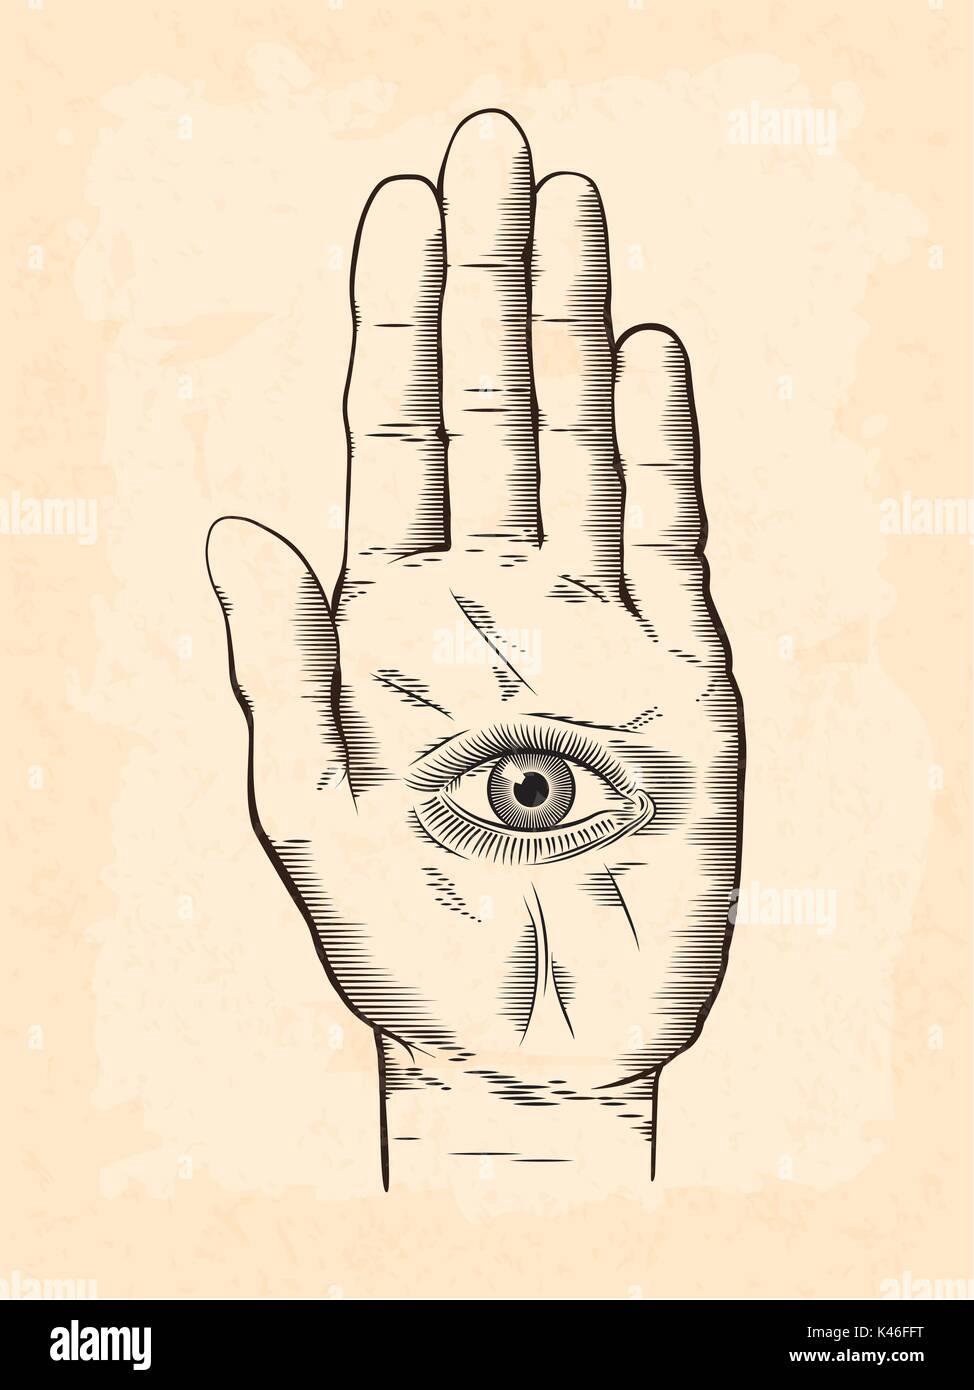 Hamsa stock photos hamsa stock images alamy vector illustration of mystic hamsa all seeing eye in hand symbol vintage engraved style biocorpaavc